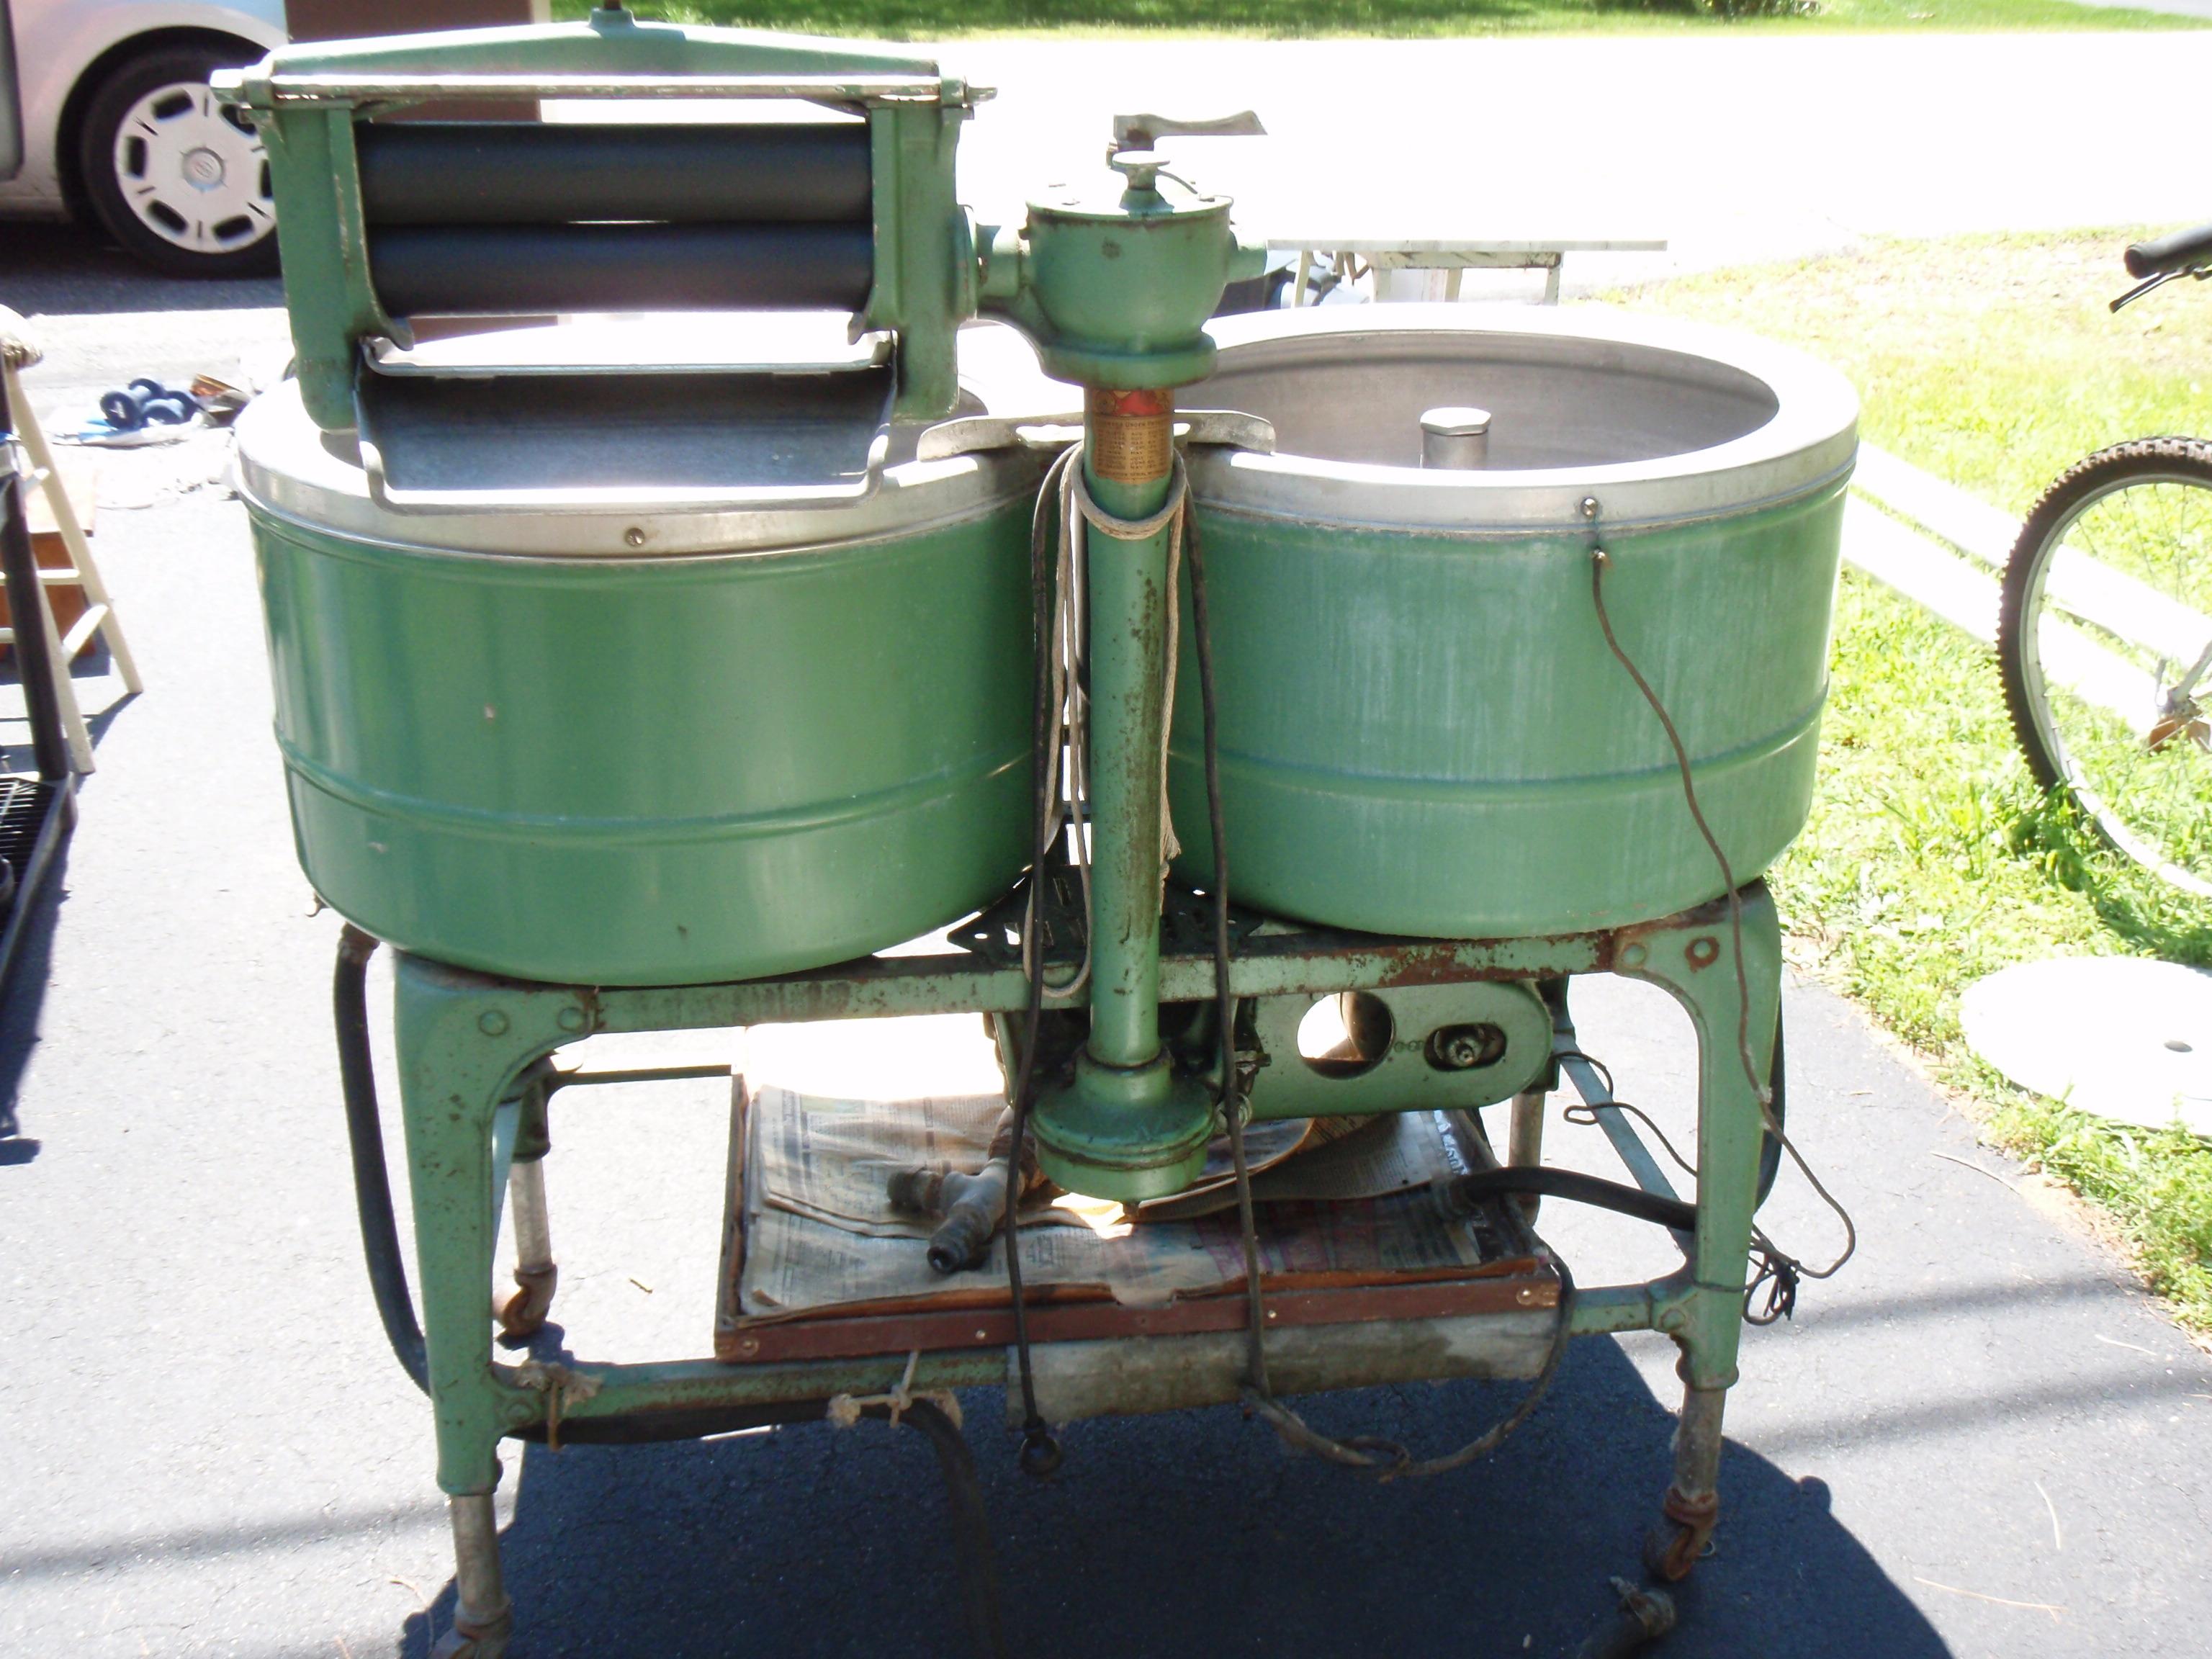 vintage washing machines for sale jpg 422x640